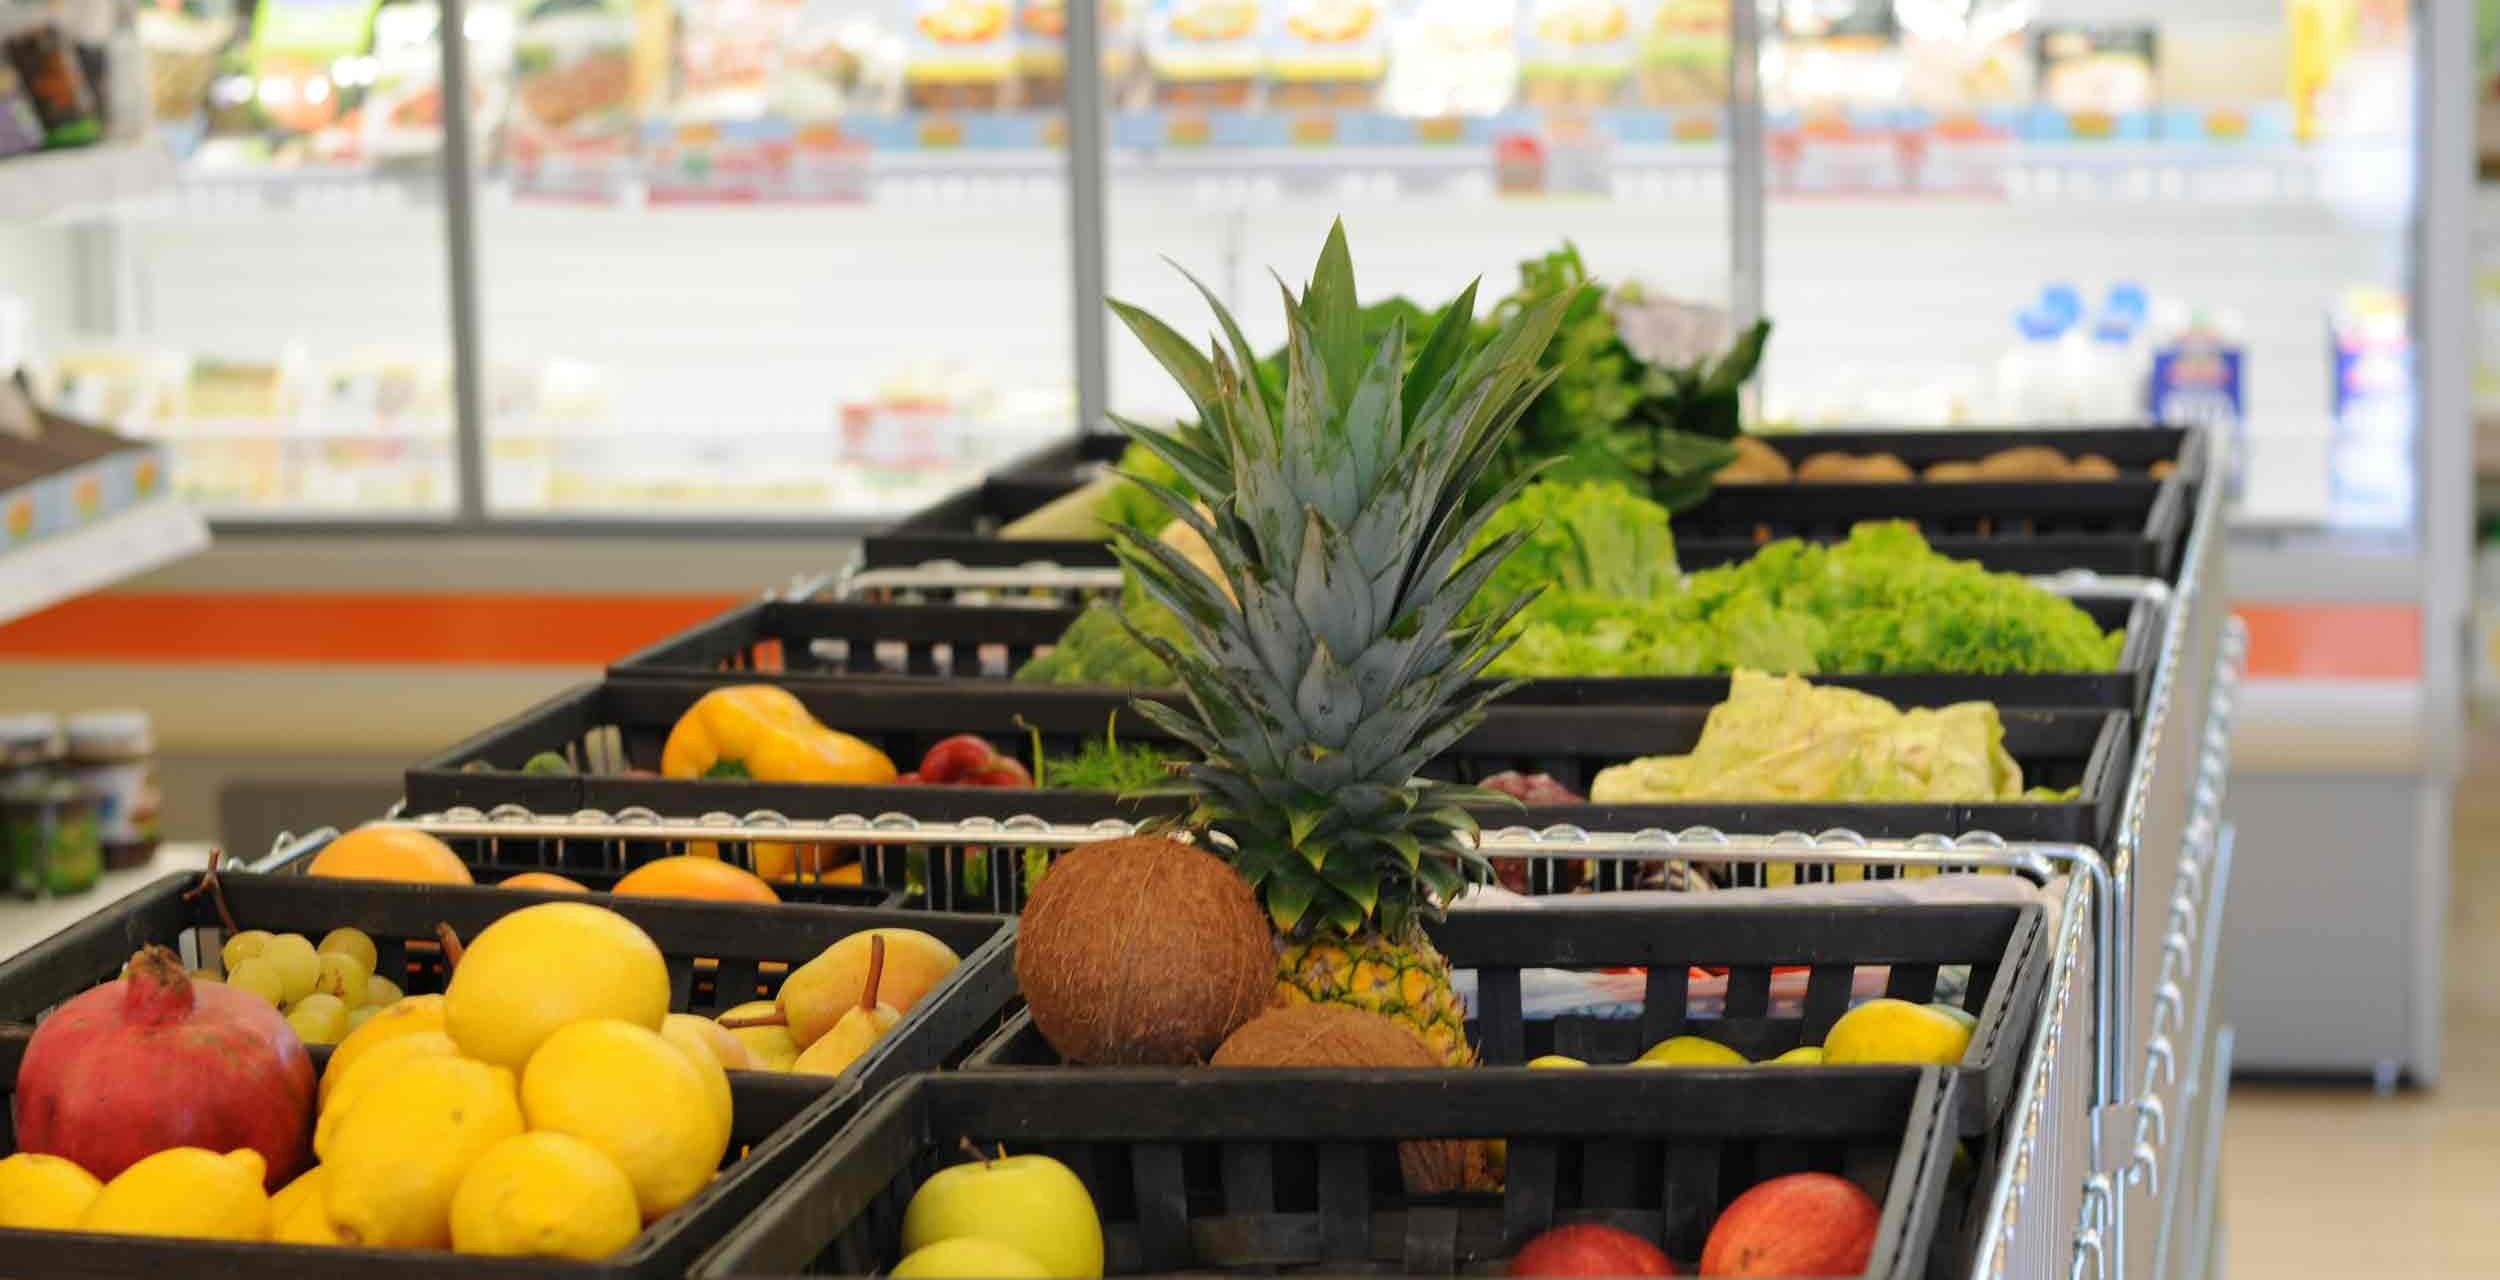 frutta e verdura bio fresca biologica